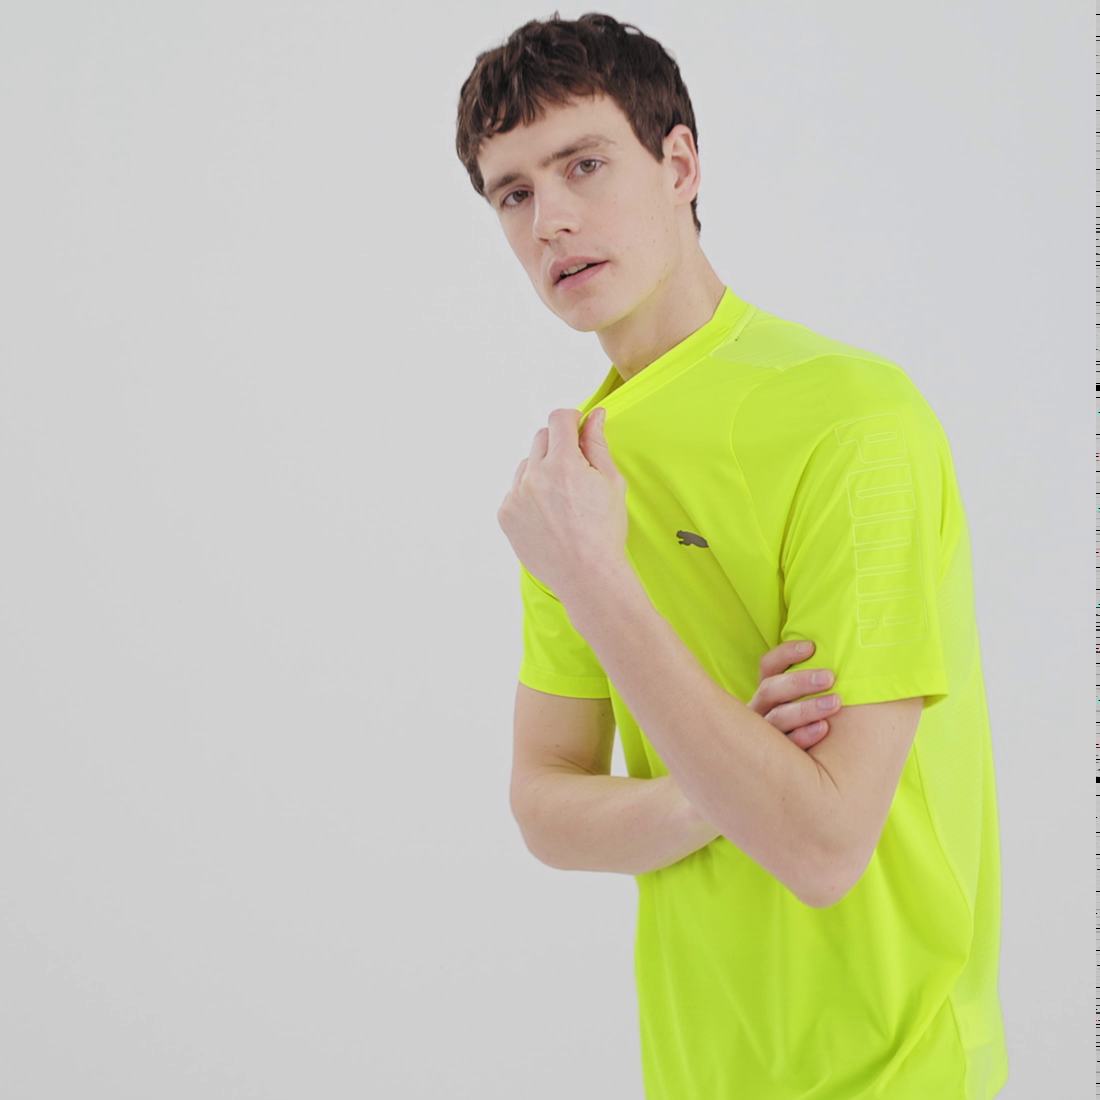 Image PUMA Camiseta Power Thermo R+ Masculina #6